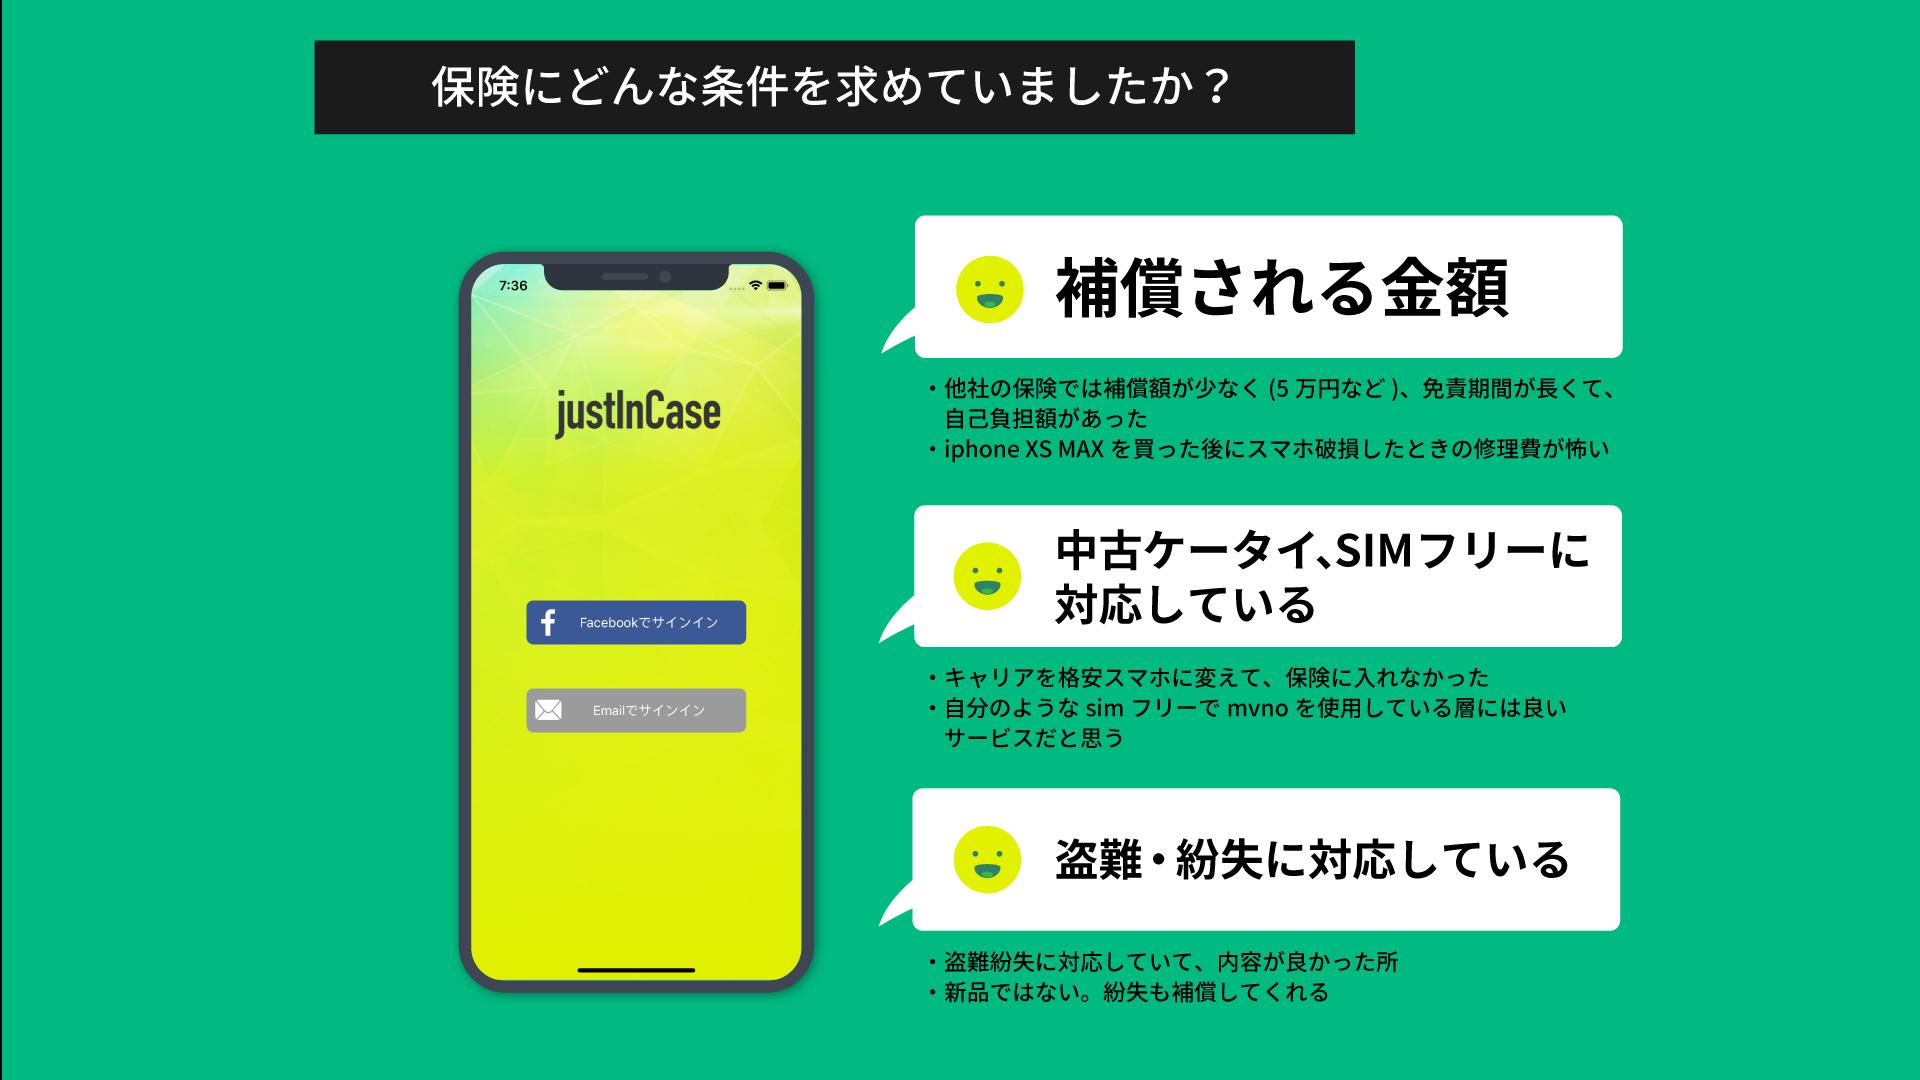 justincase_review169.png